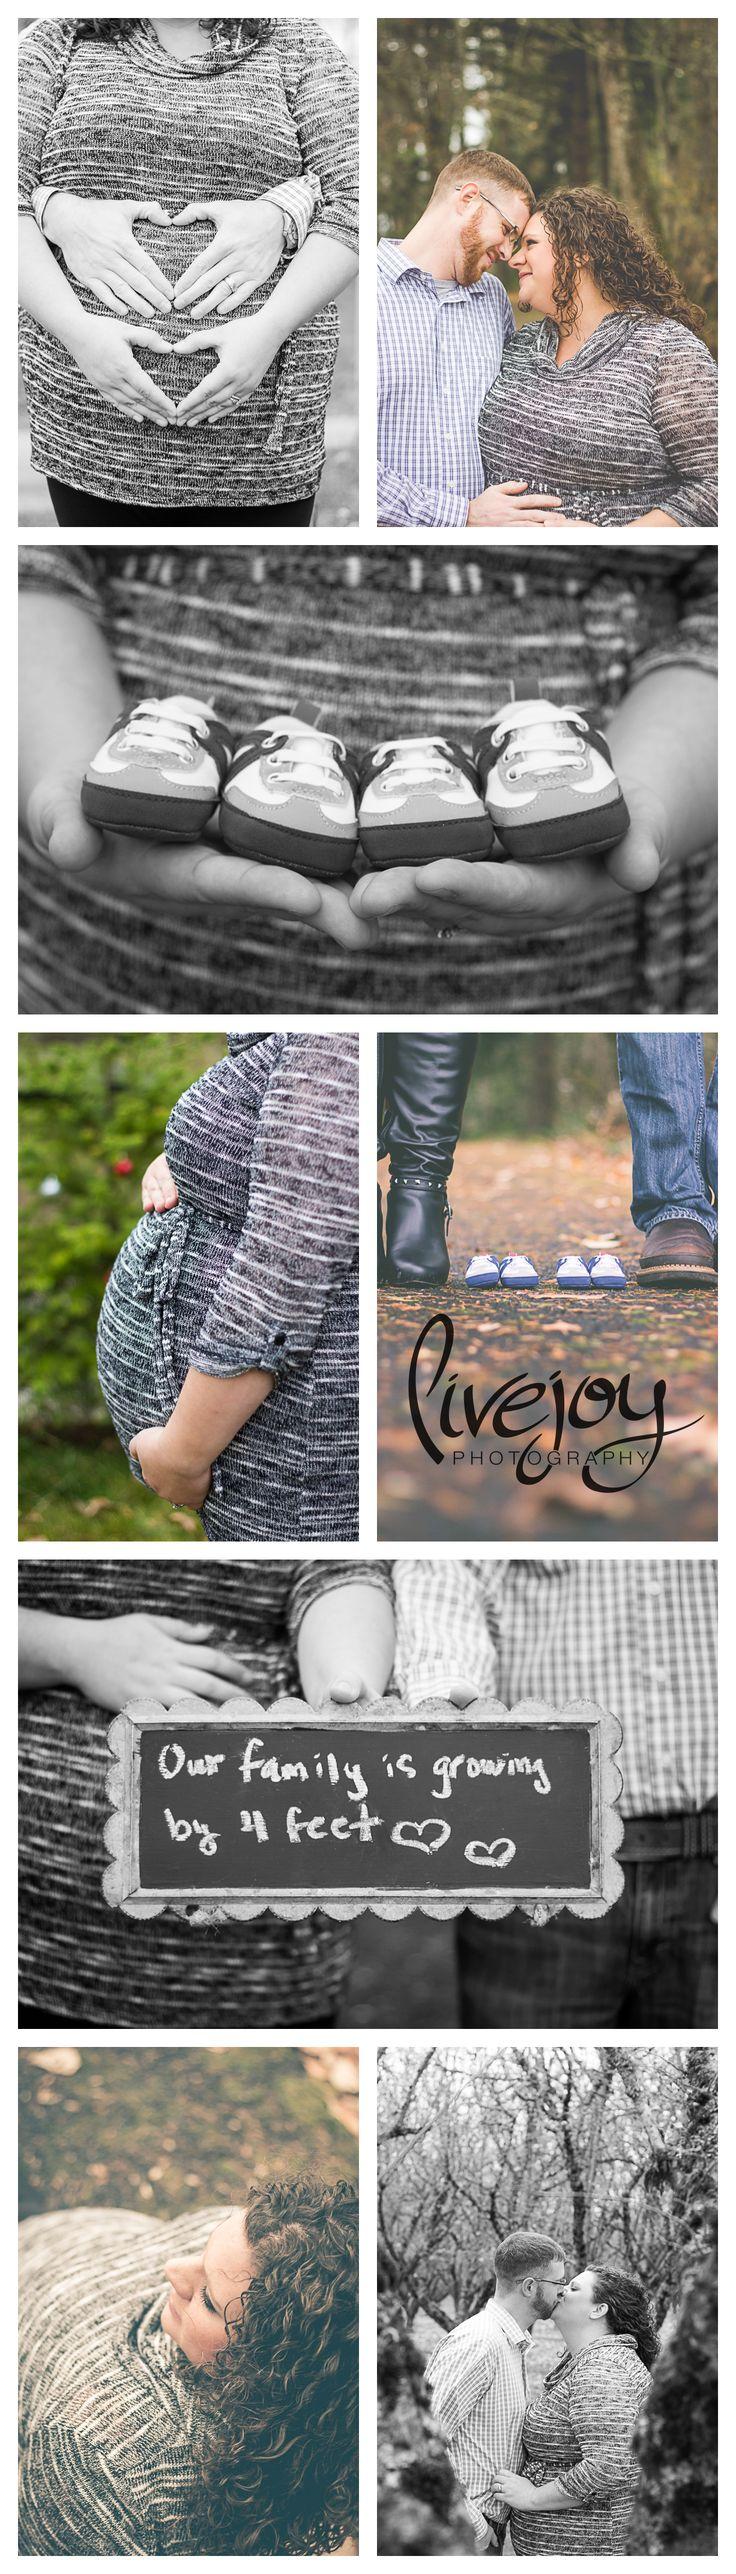 Maternity Photography Twins #LiveJoyPhotography #Maternity #Photography